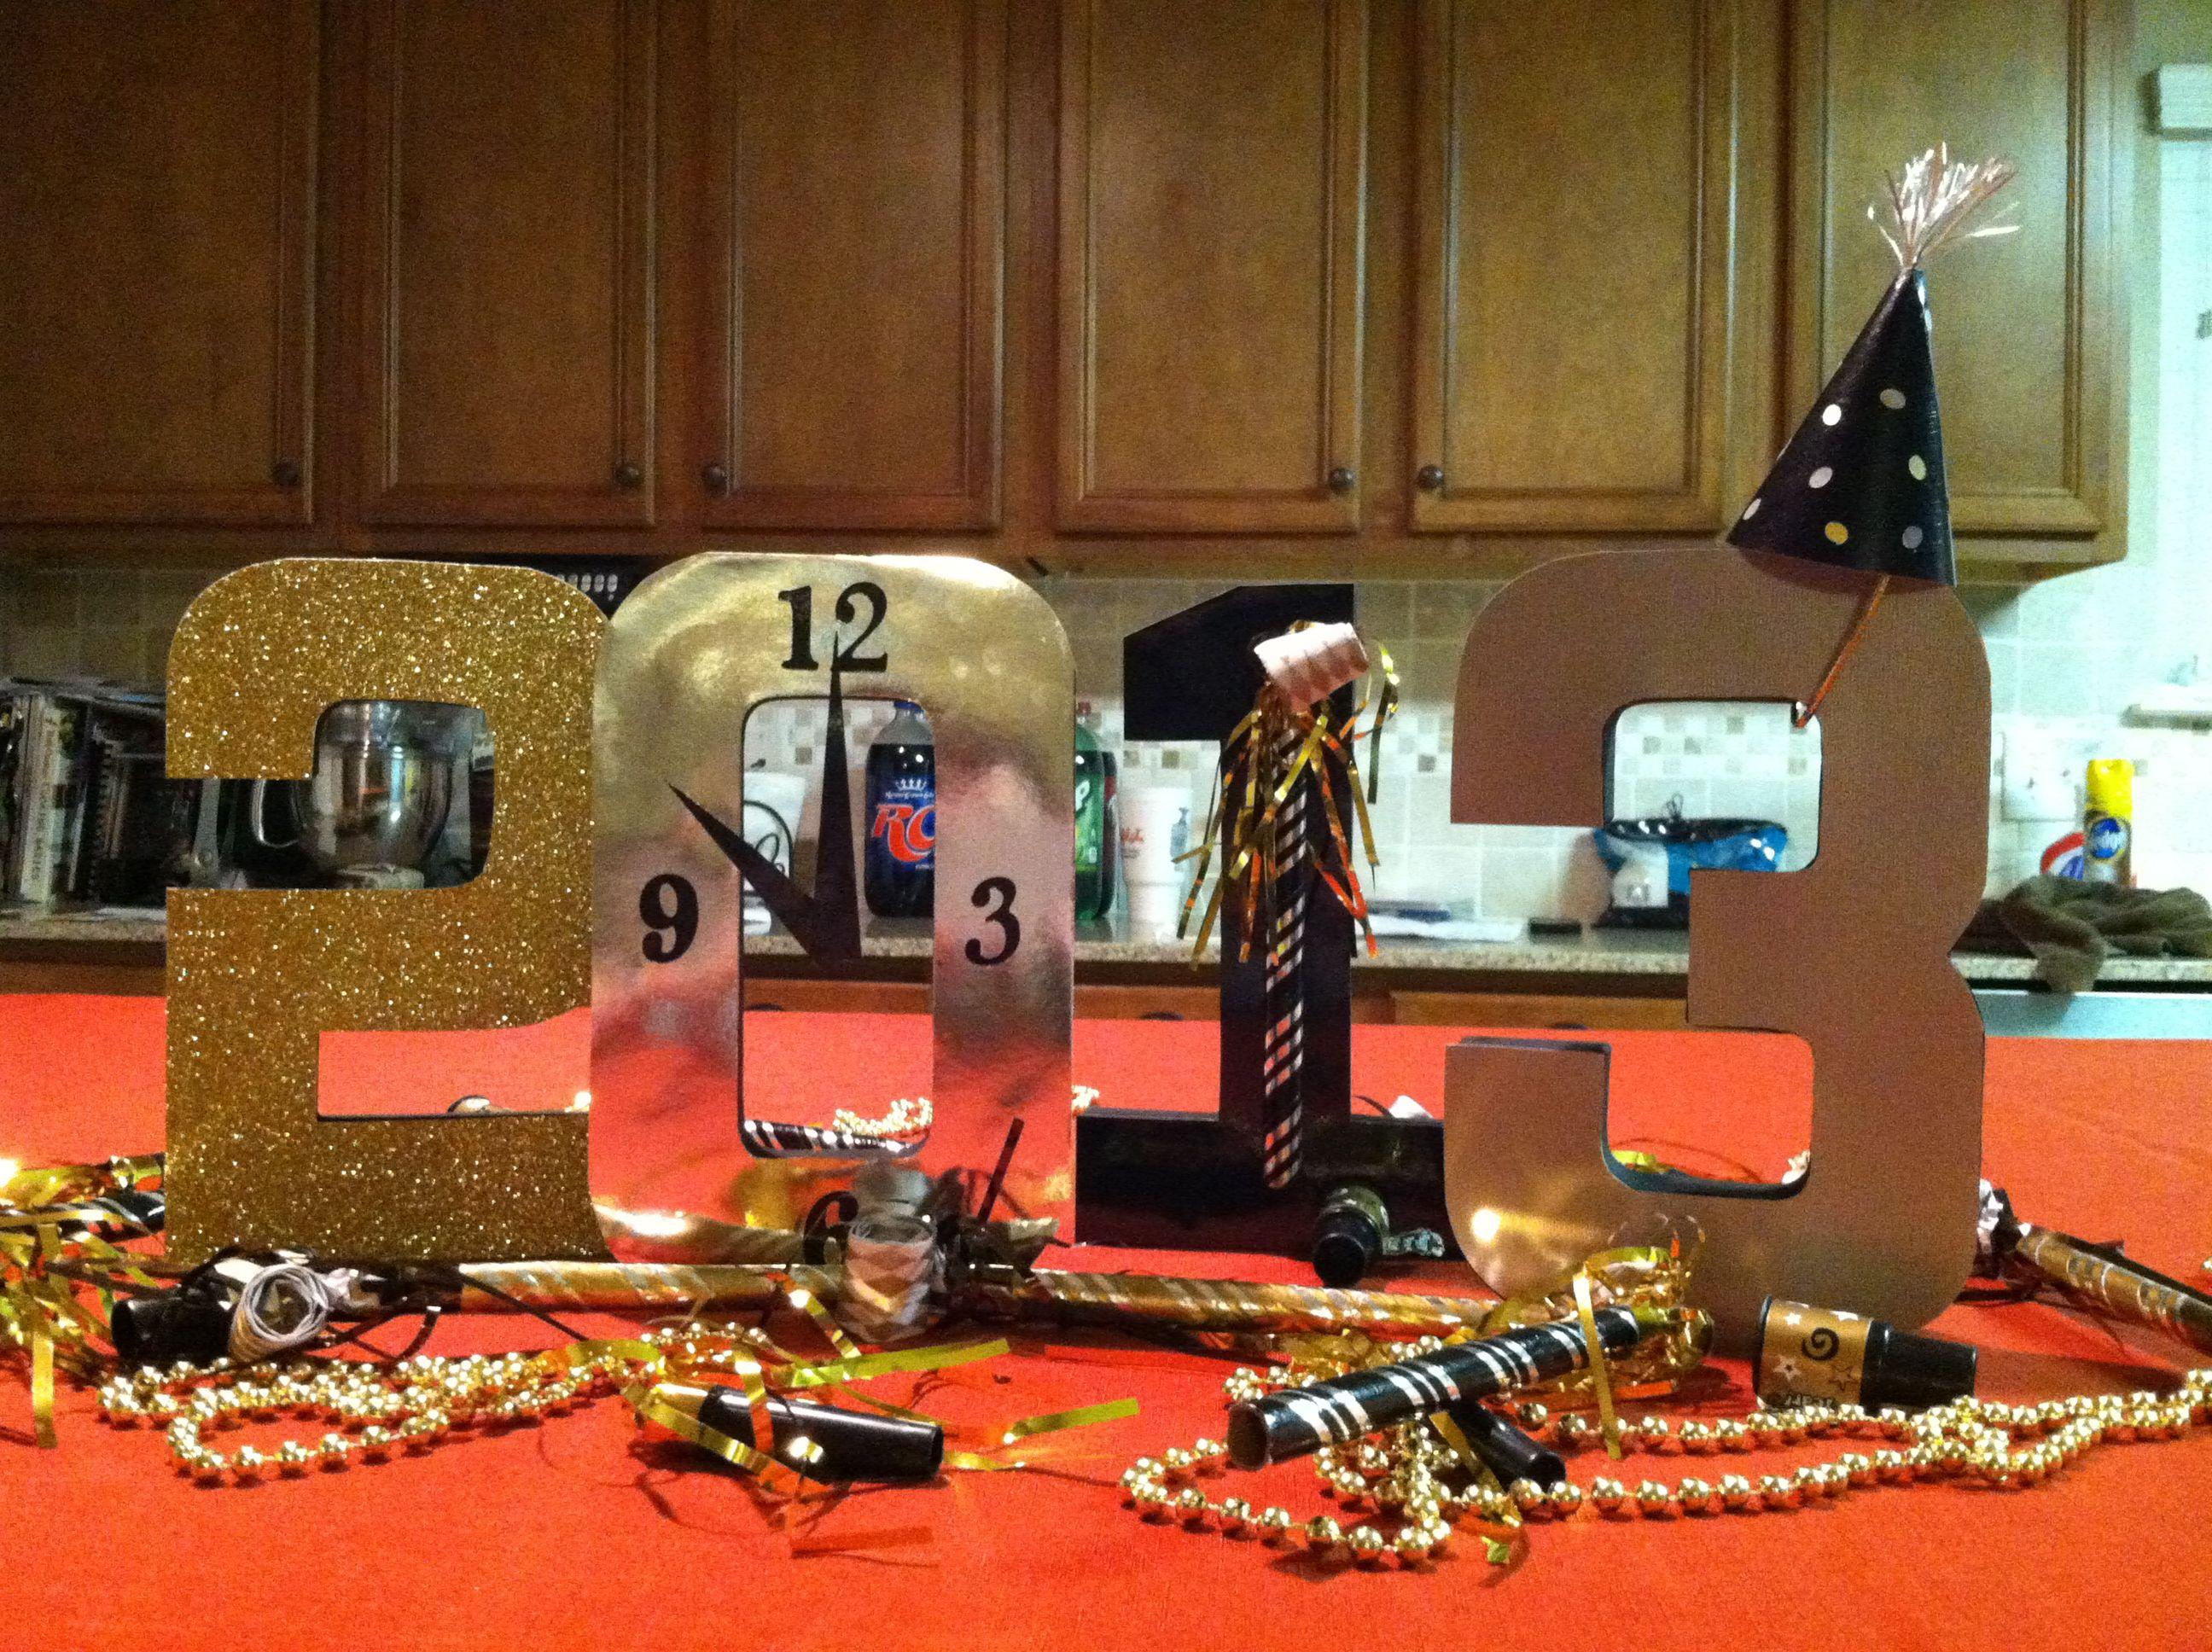 #DIY New Year decorations/centerpiece. Paper mâché numbers ...